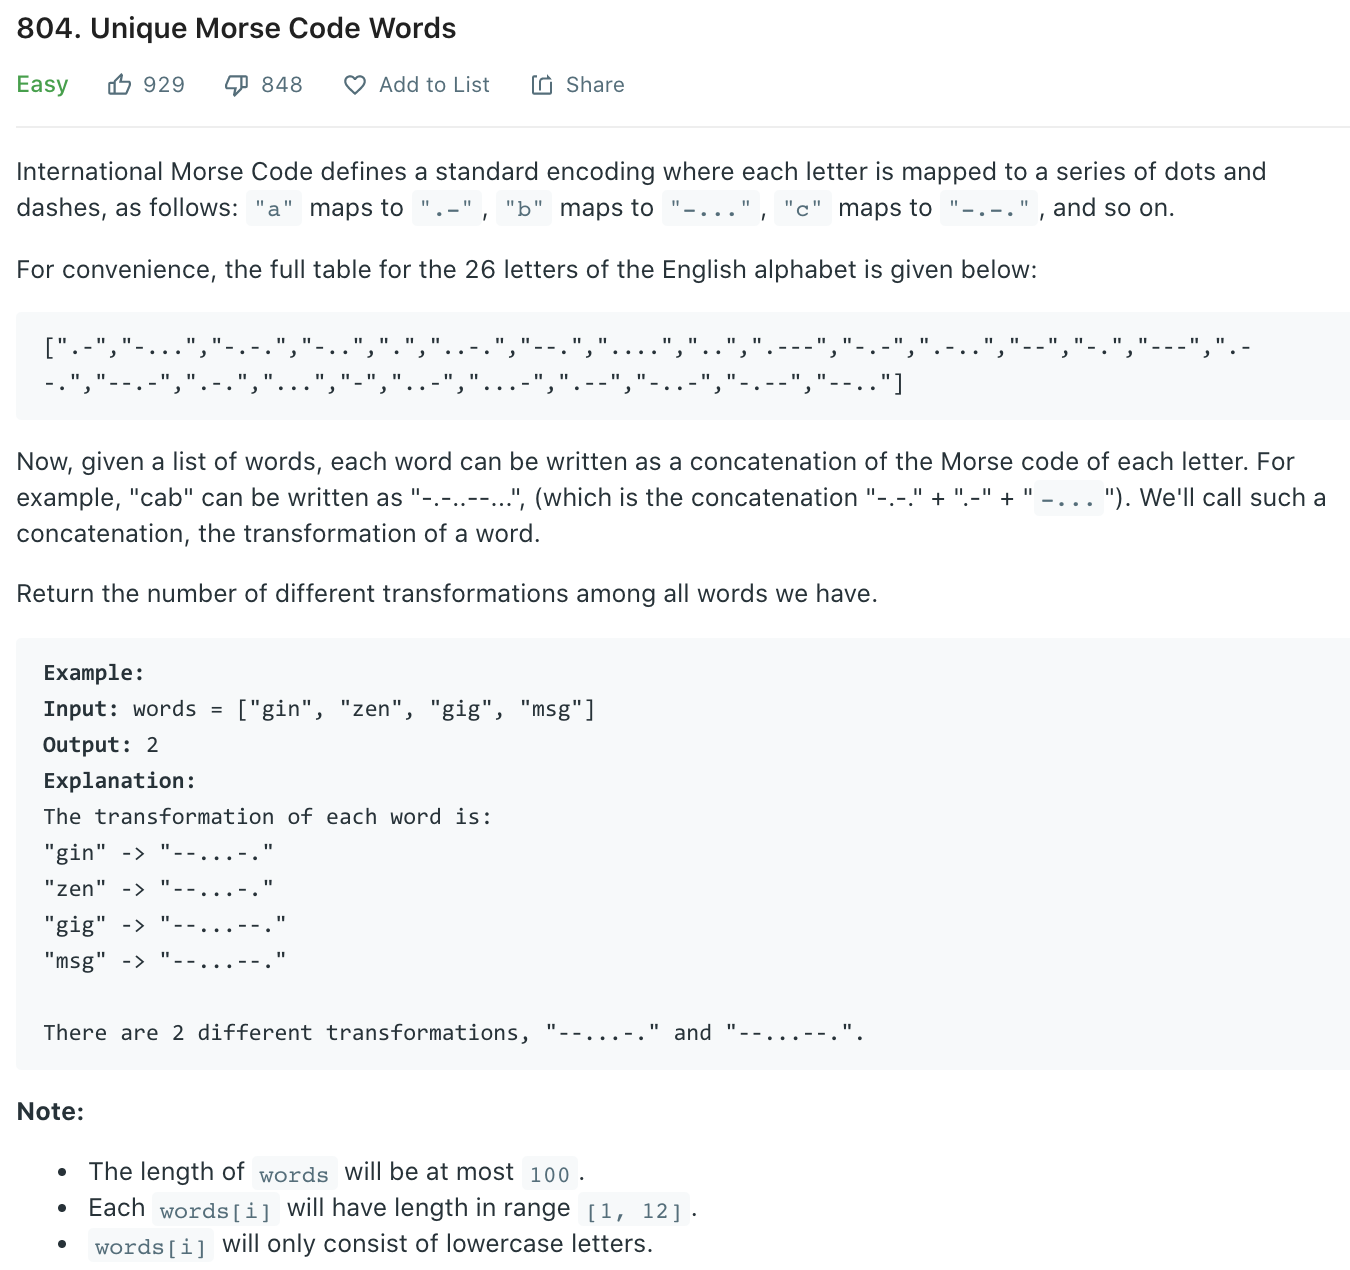 Unique Morse Code Words